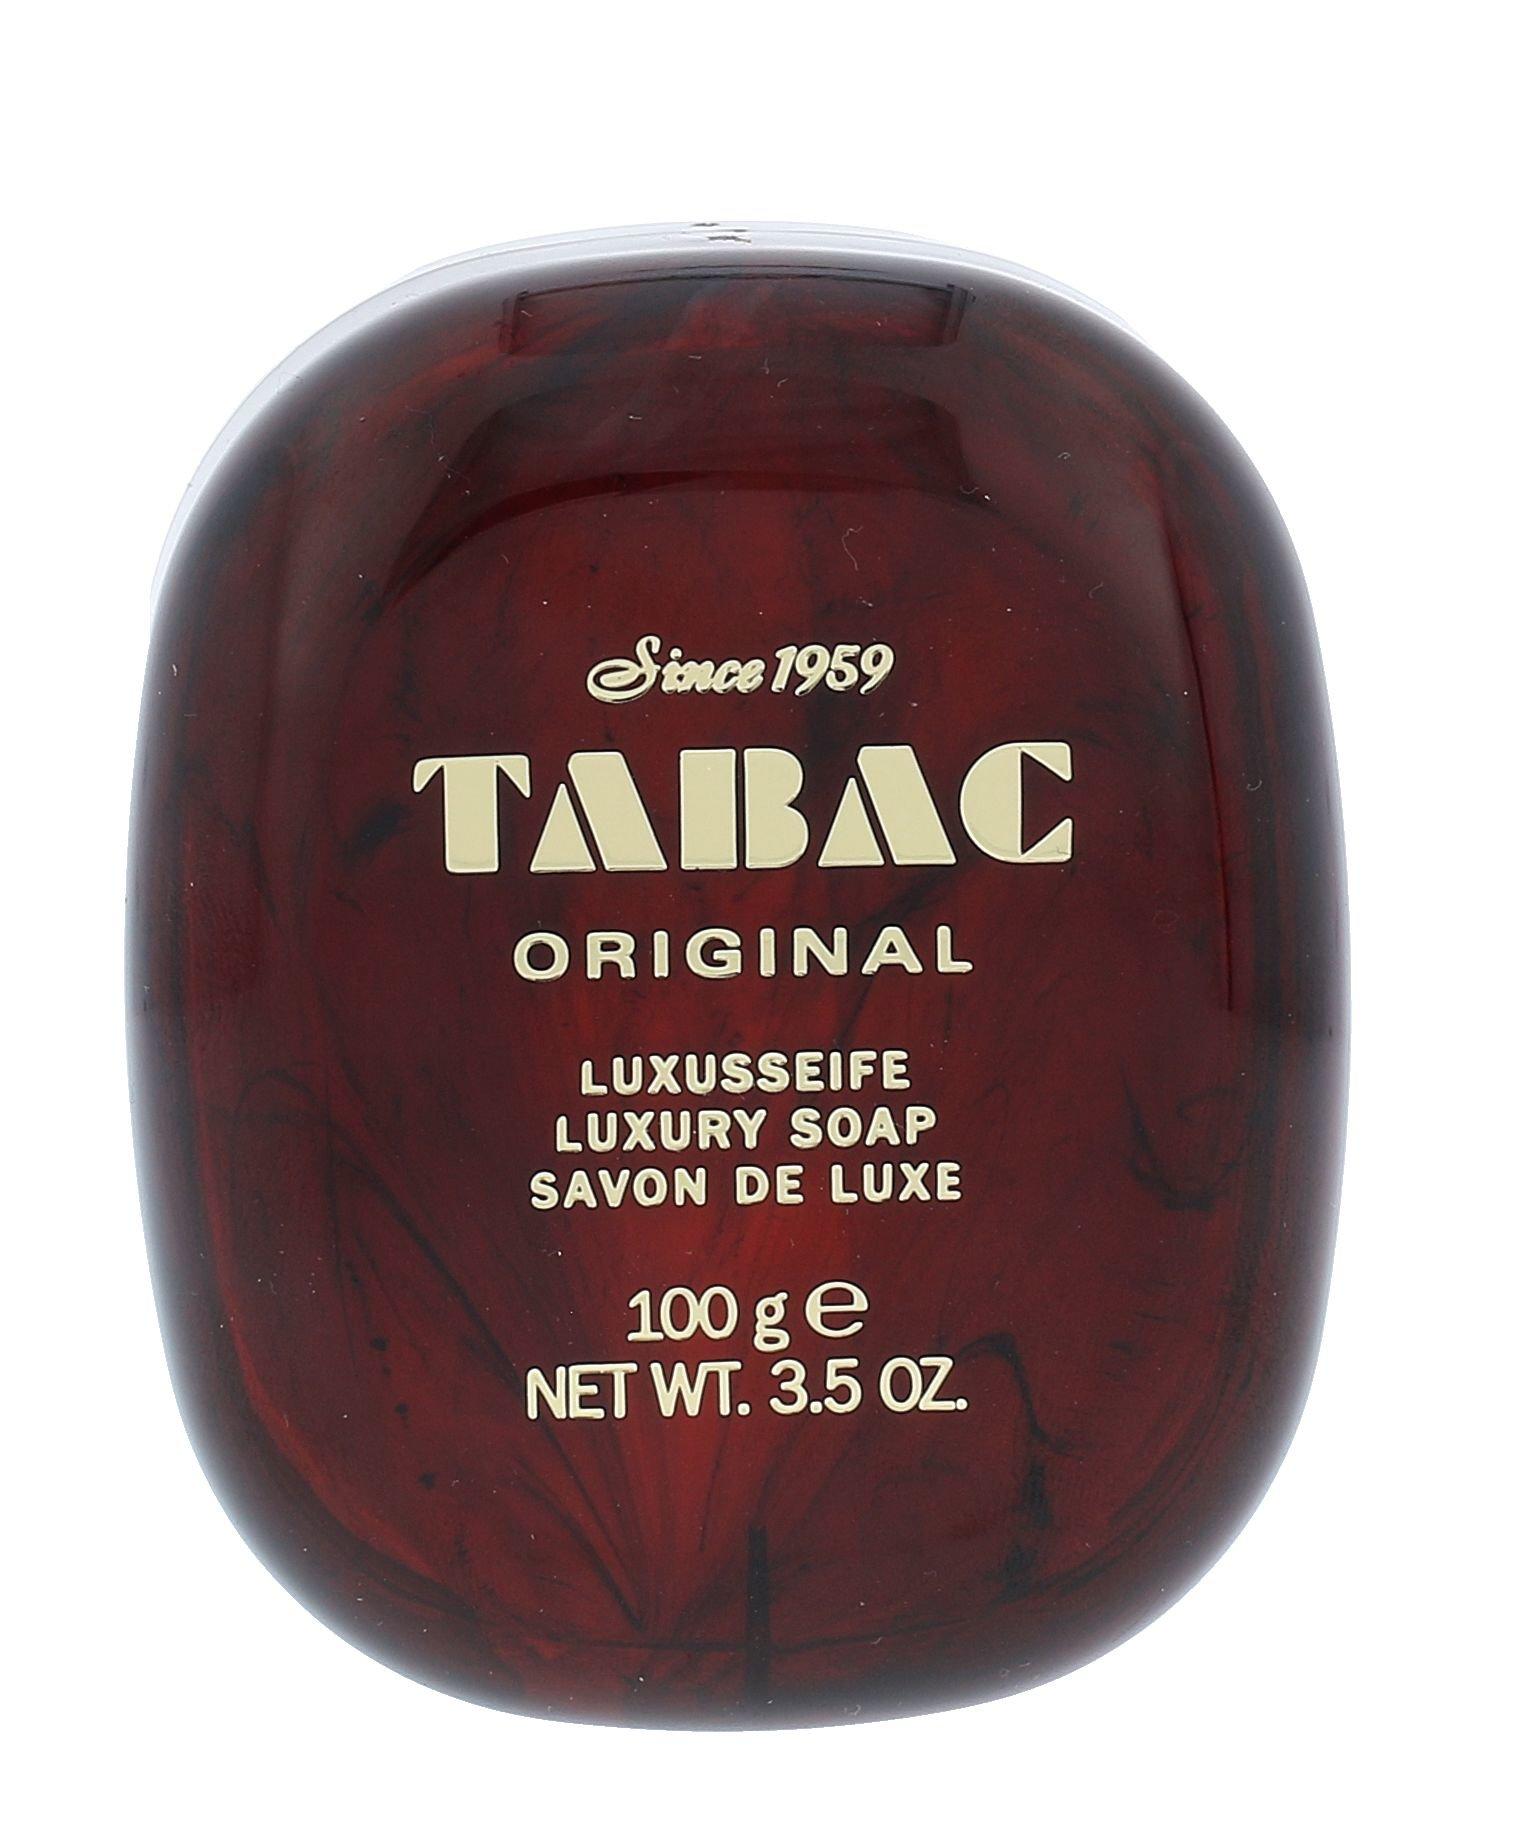 Tabac Original Tuhé soap 100g